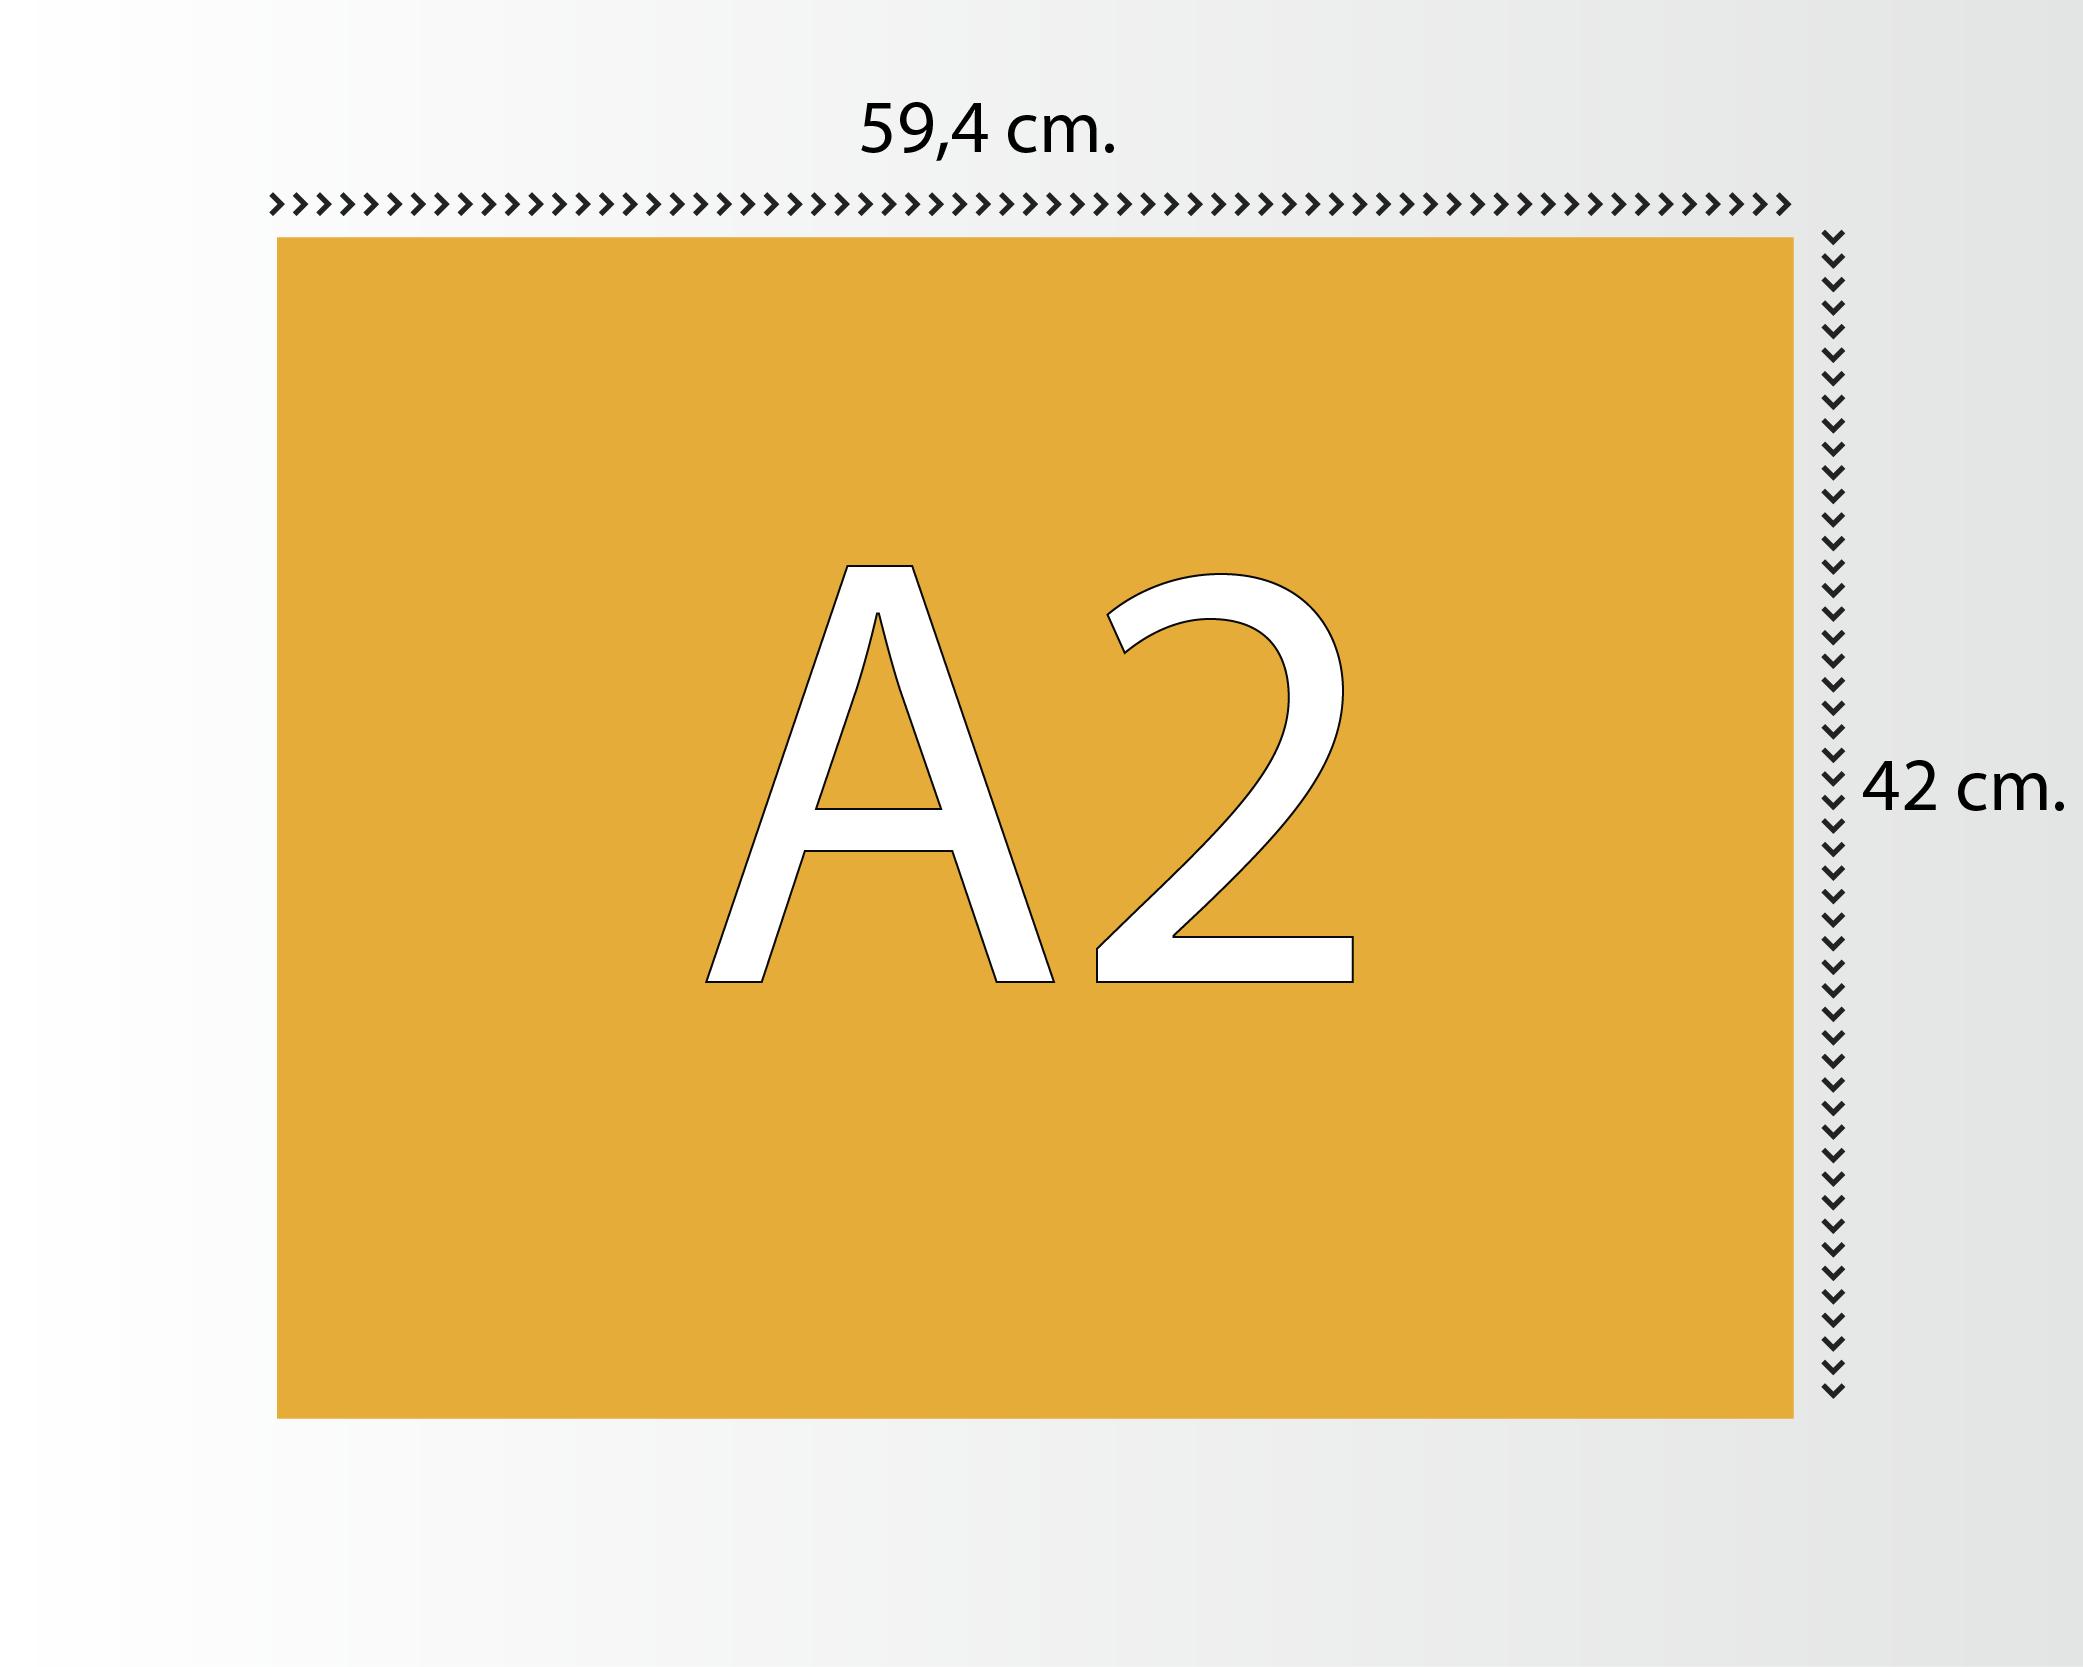 A2 ORIZZONTALE